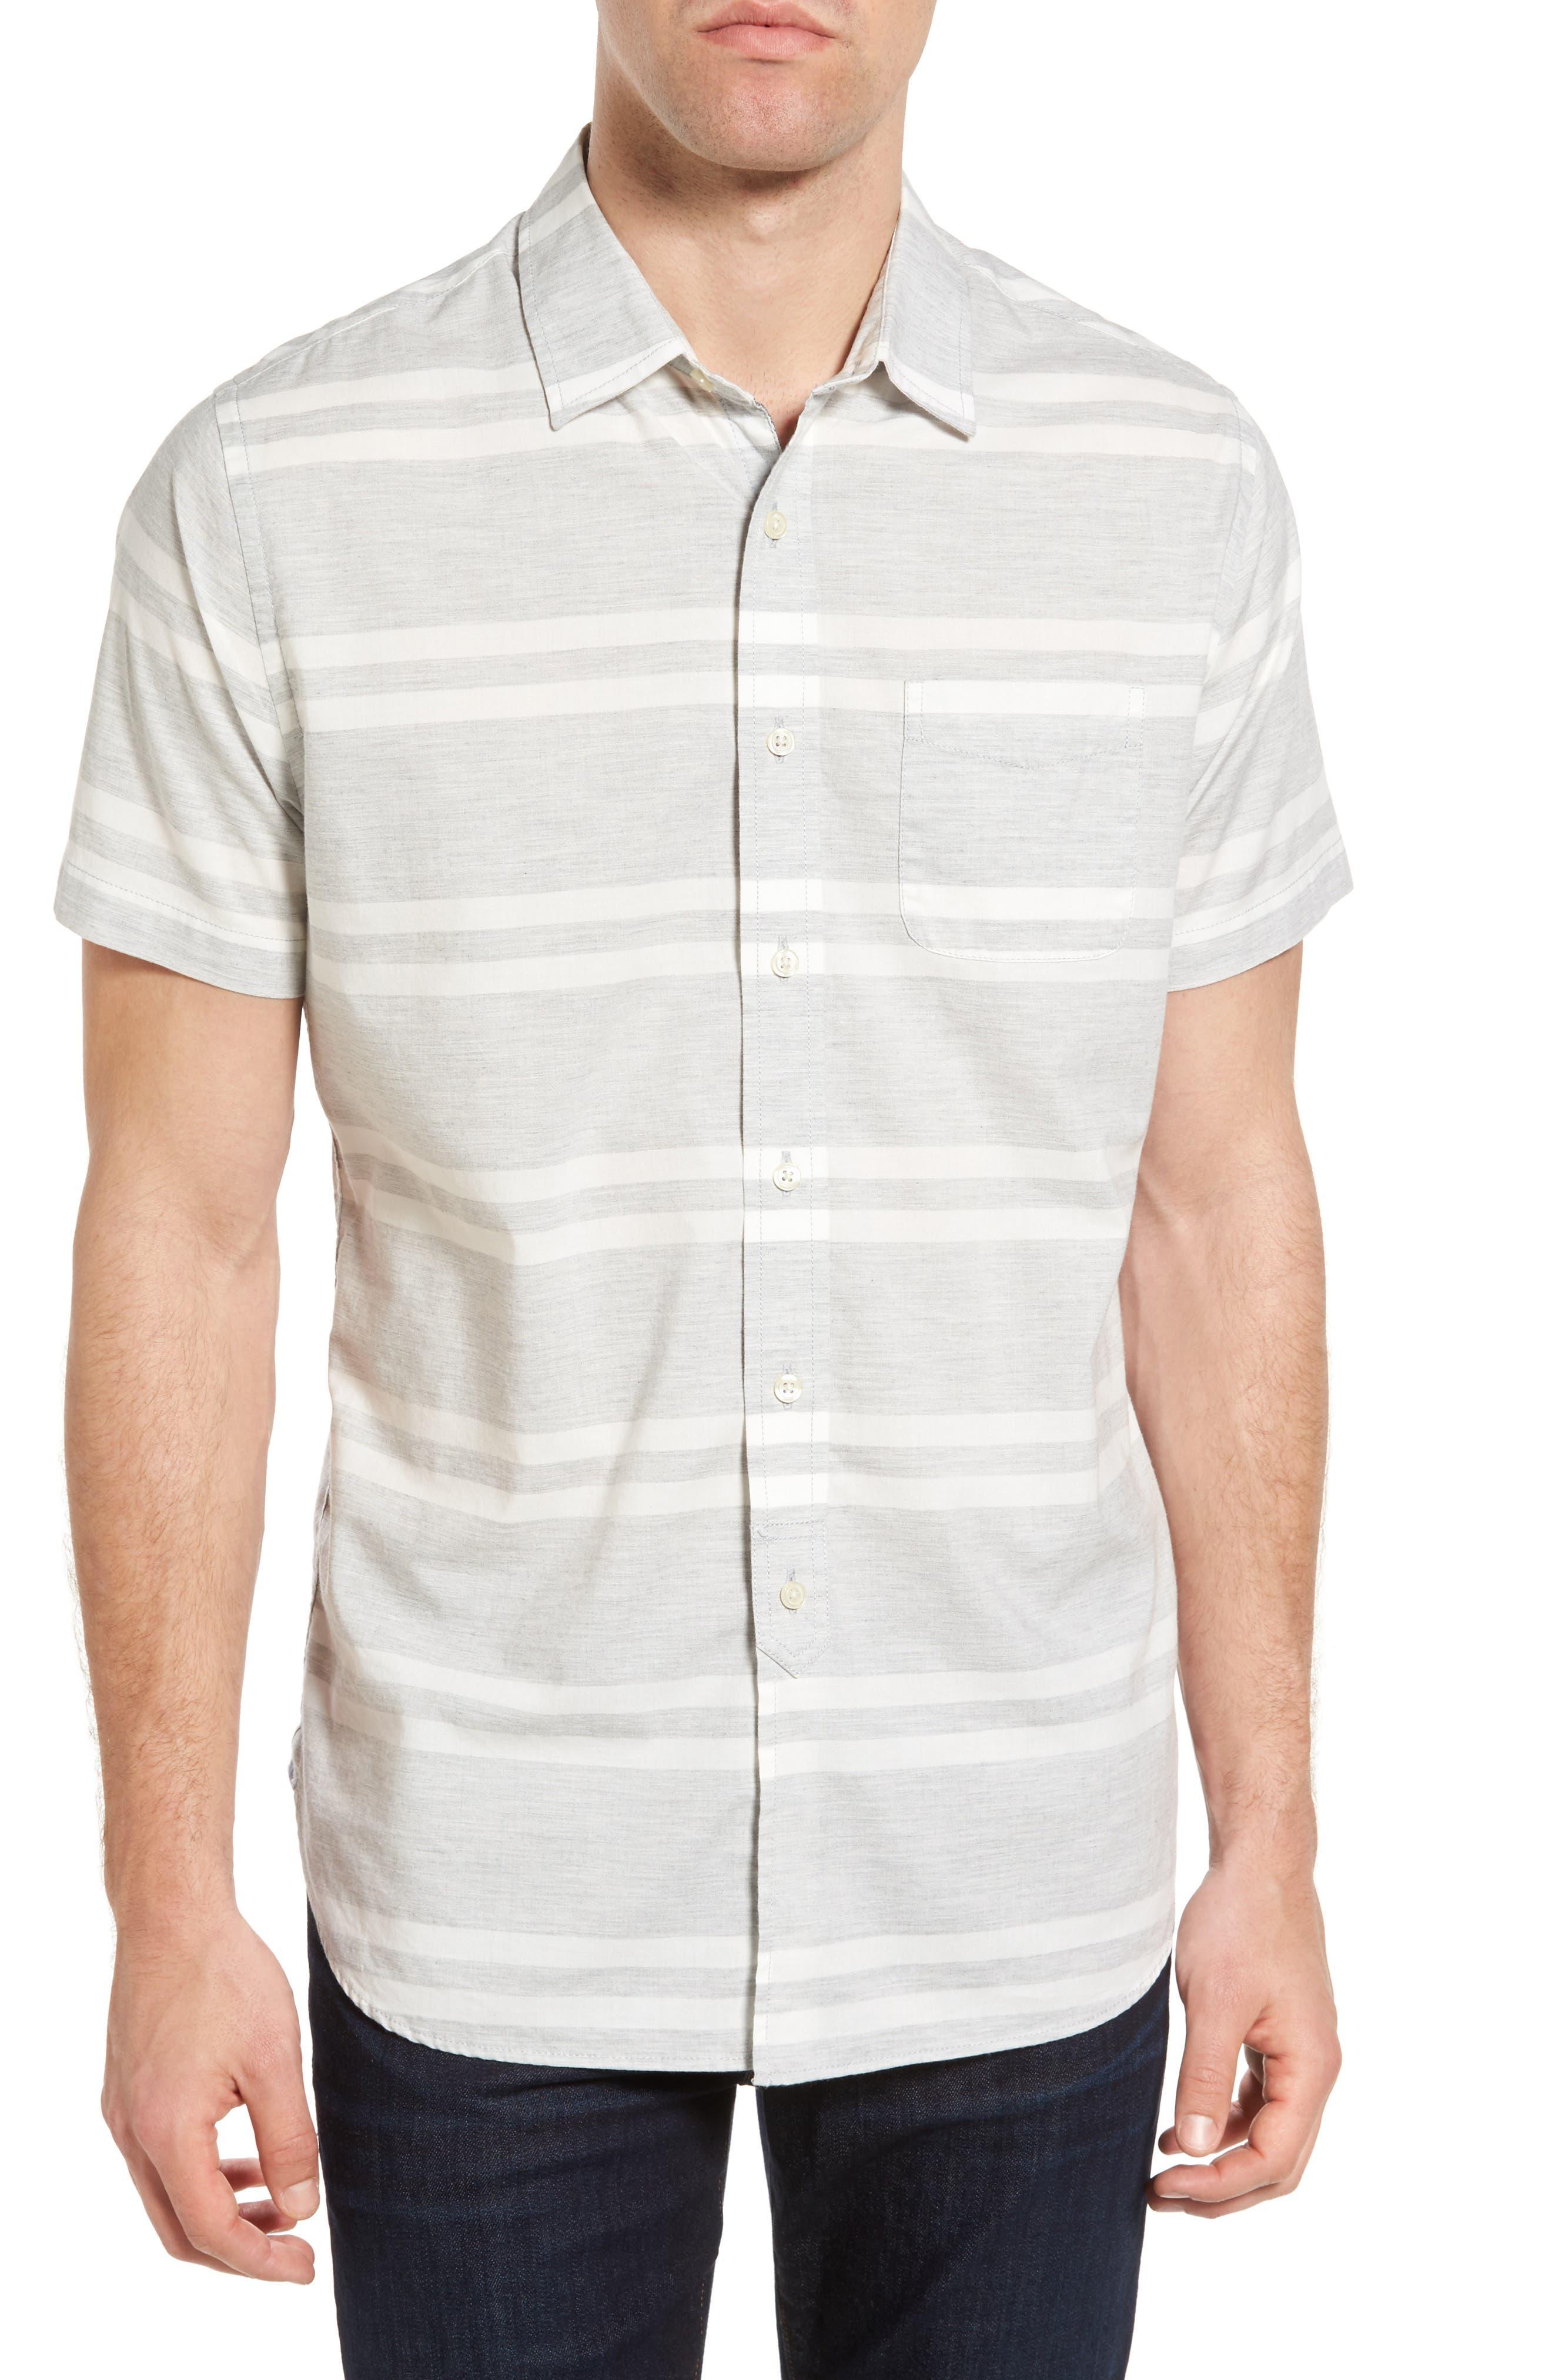 Grayers Gramercy Trim Fit Stripe Chambray Sport Shirt